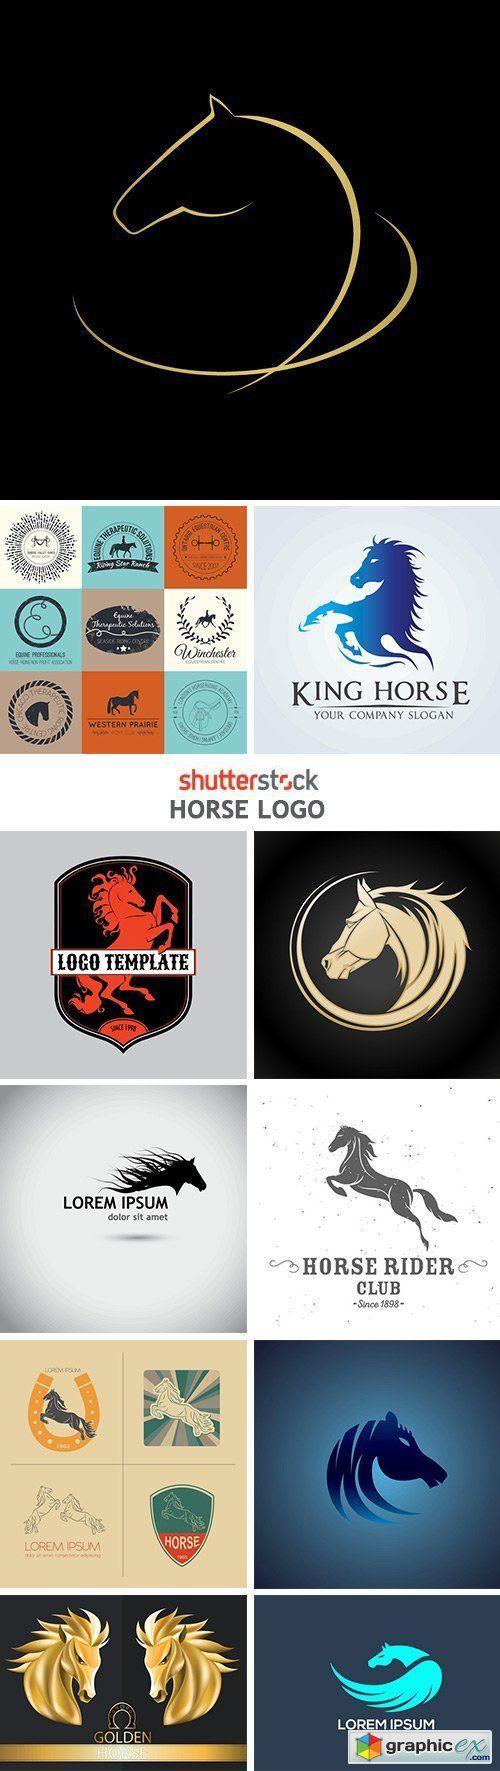 T shirt design 7 25xeps - Horse Logo 25xeps More